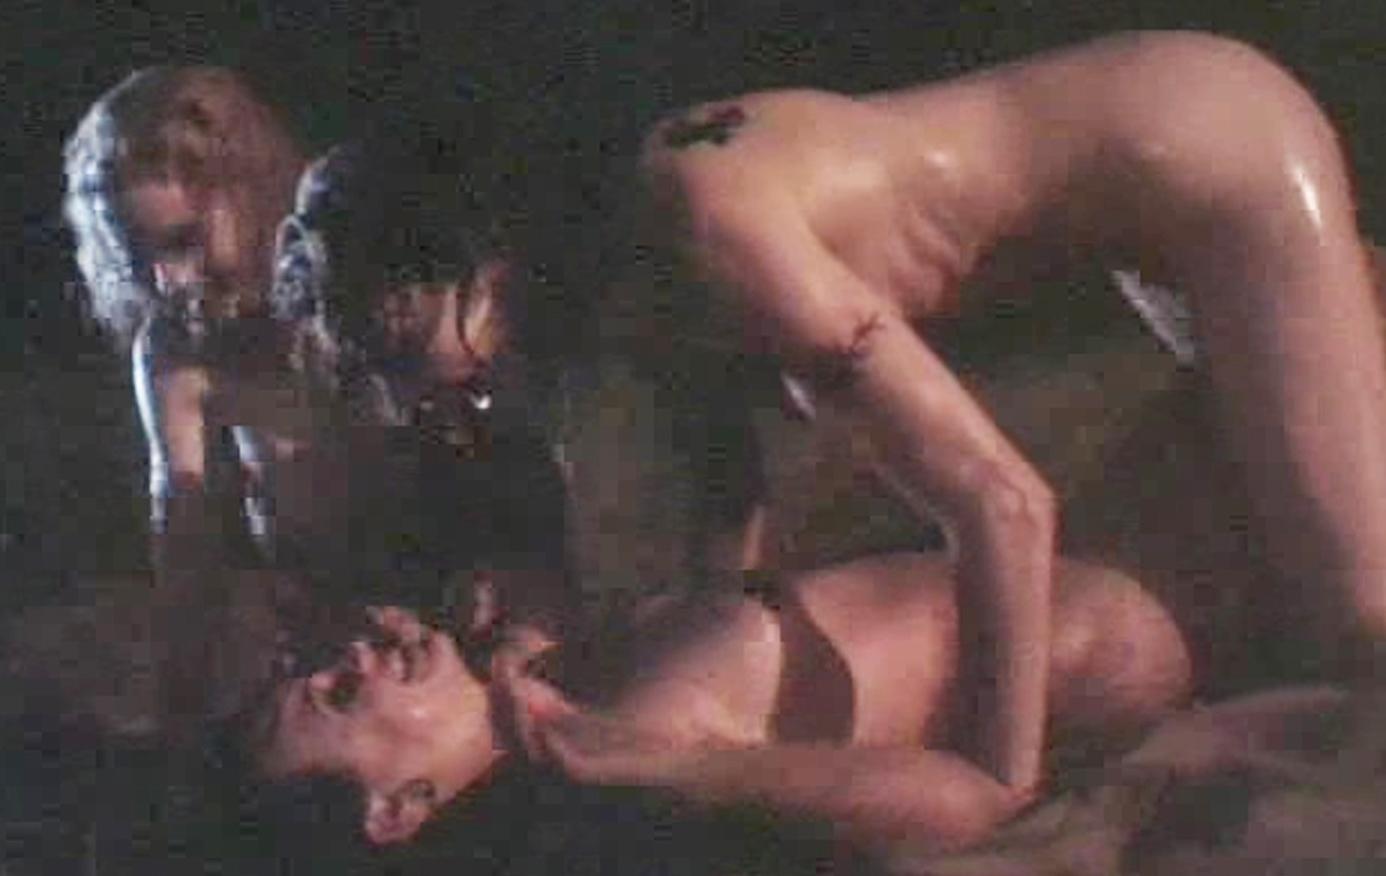 Orc rape fantasy porn hentai images